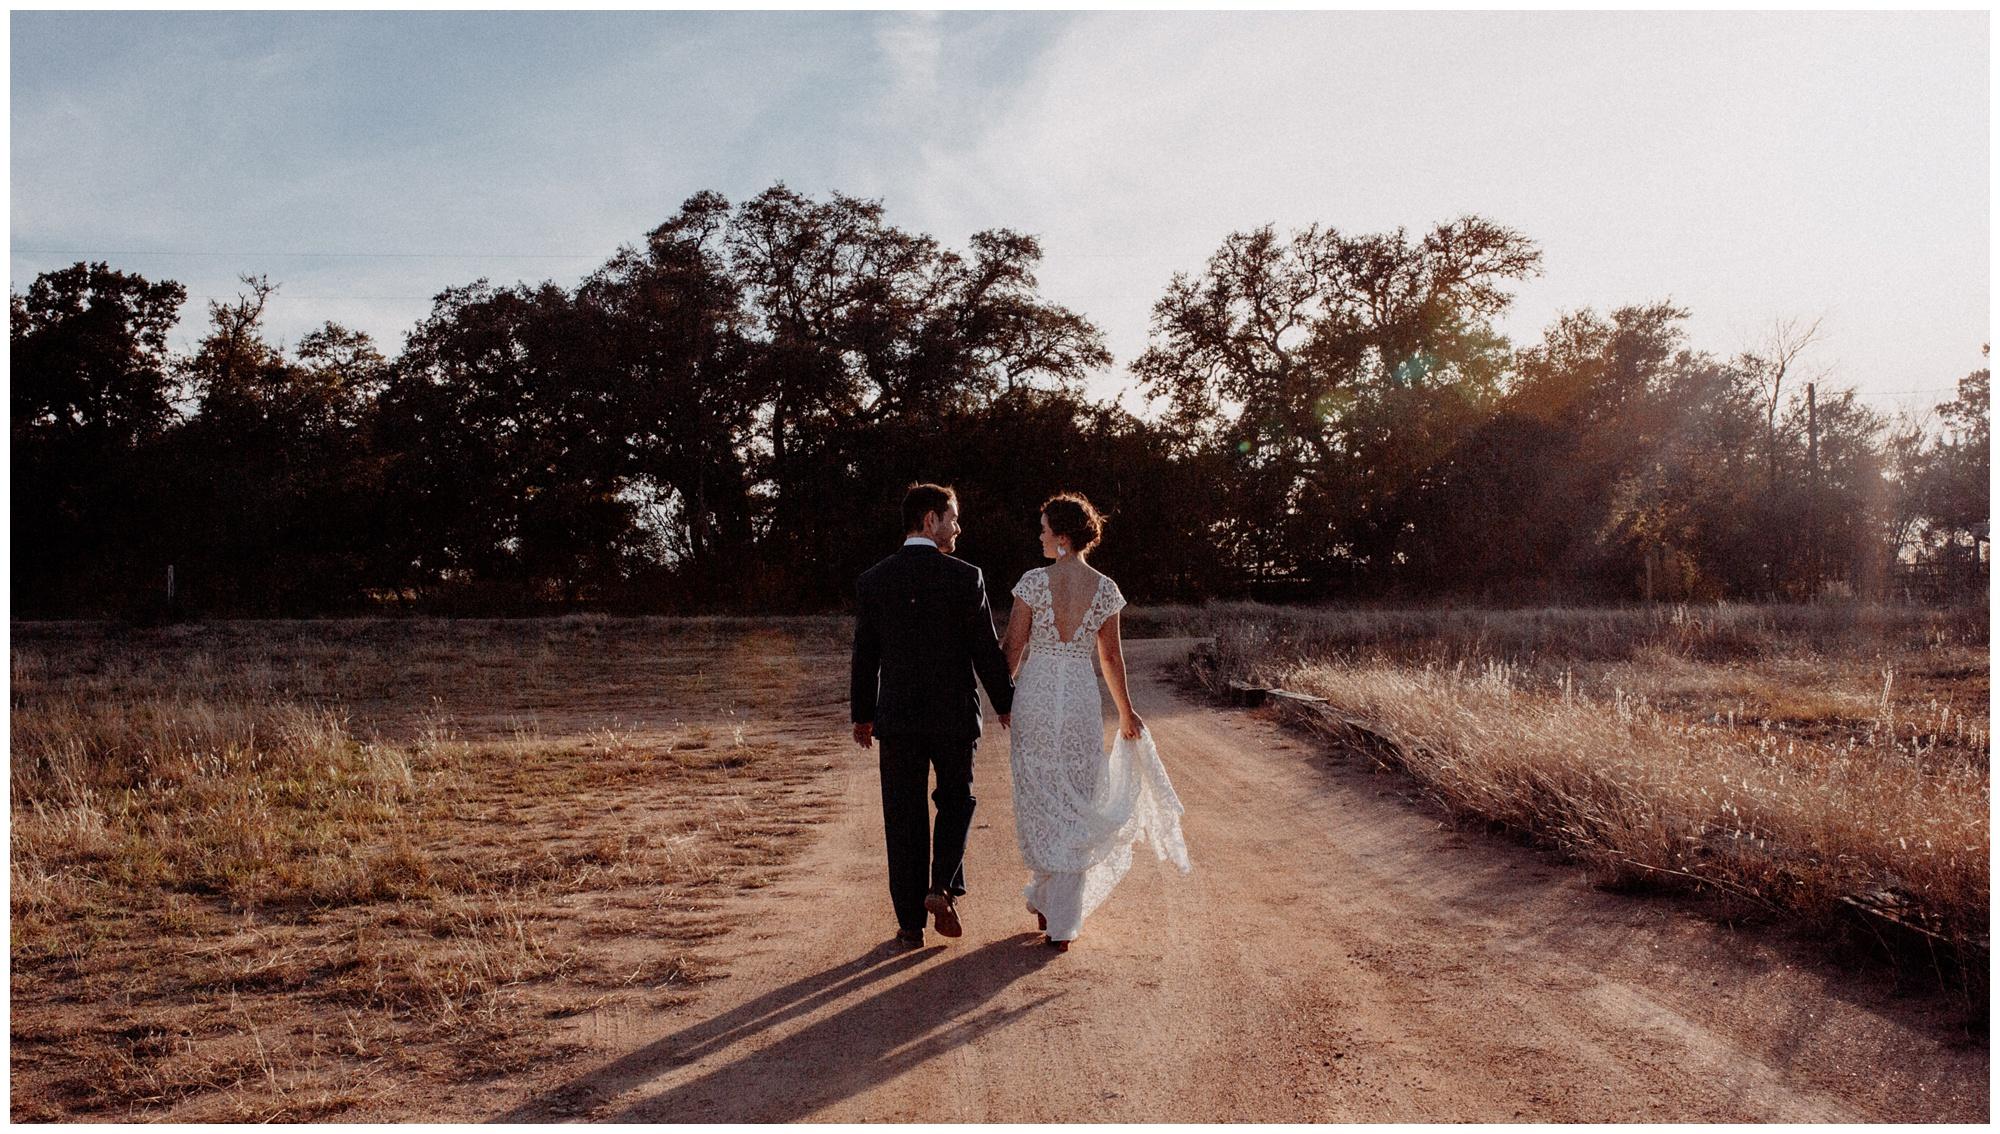 AUSTIN-TEXAS-PROSPECT-HOUSE-WEDDING-VENUE-PHOTOGRAPHY25806.JPG